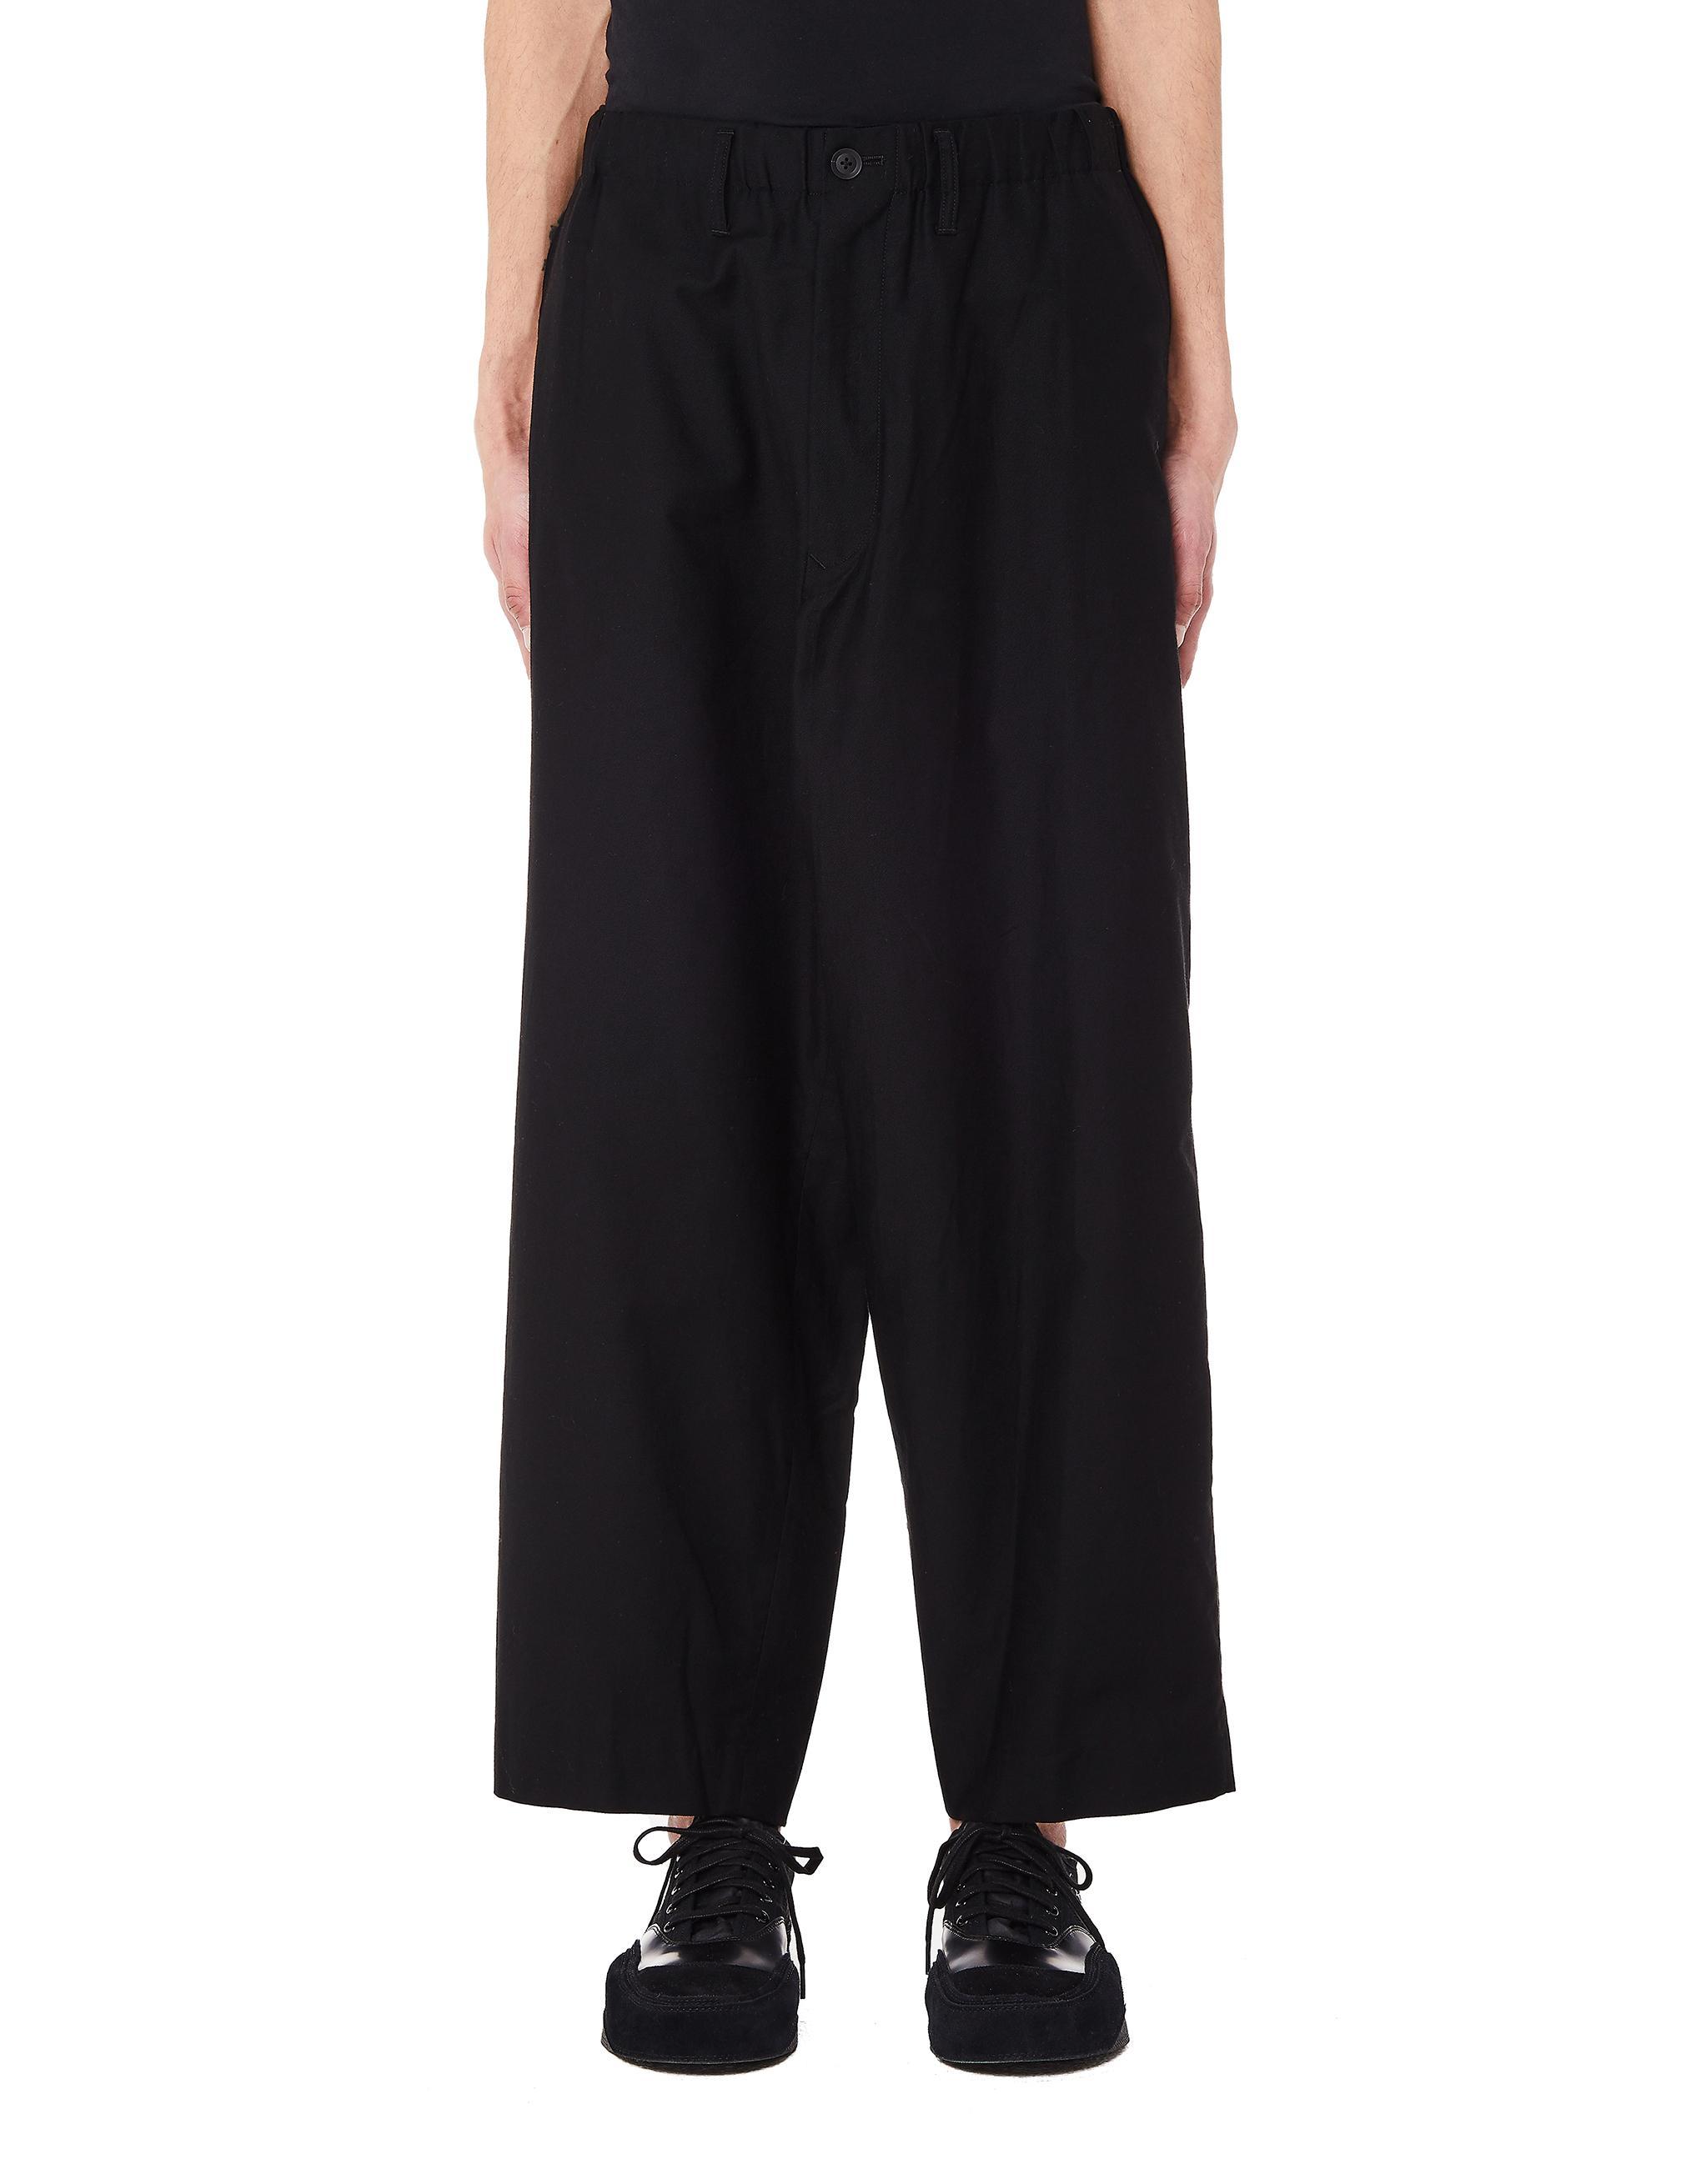 575e190b3b5 Yohji Yamamoto Cropped Wide Leg Cotton Trousers in Black for Men - Lyst